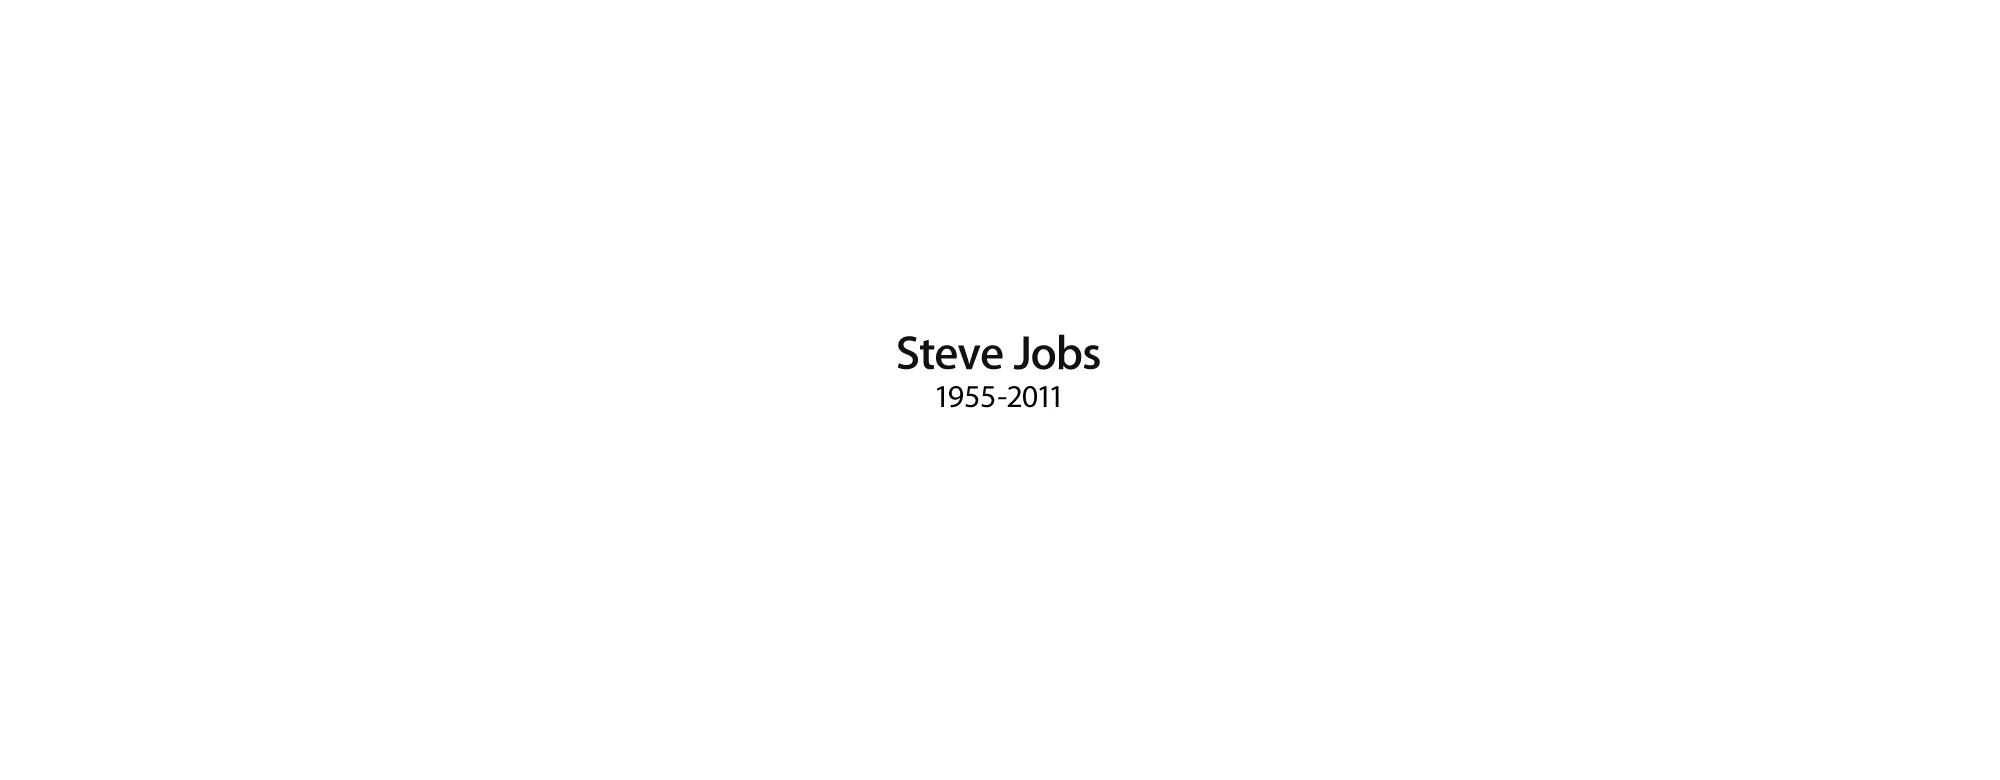 Thank You, Steve